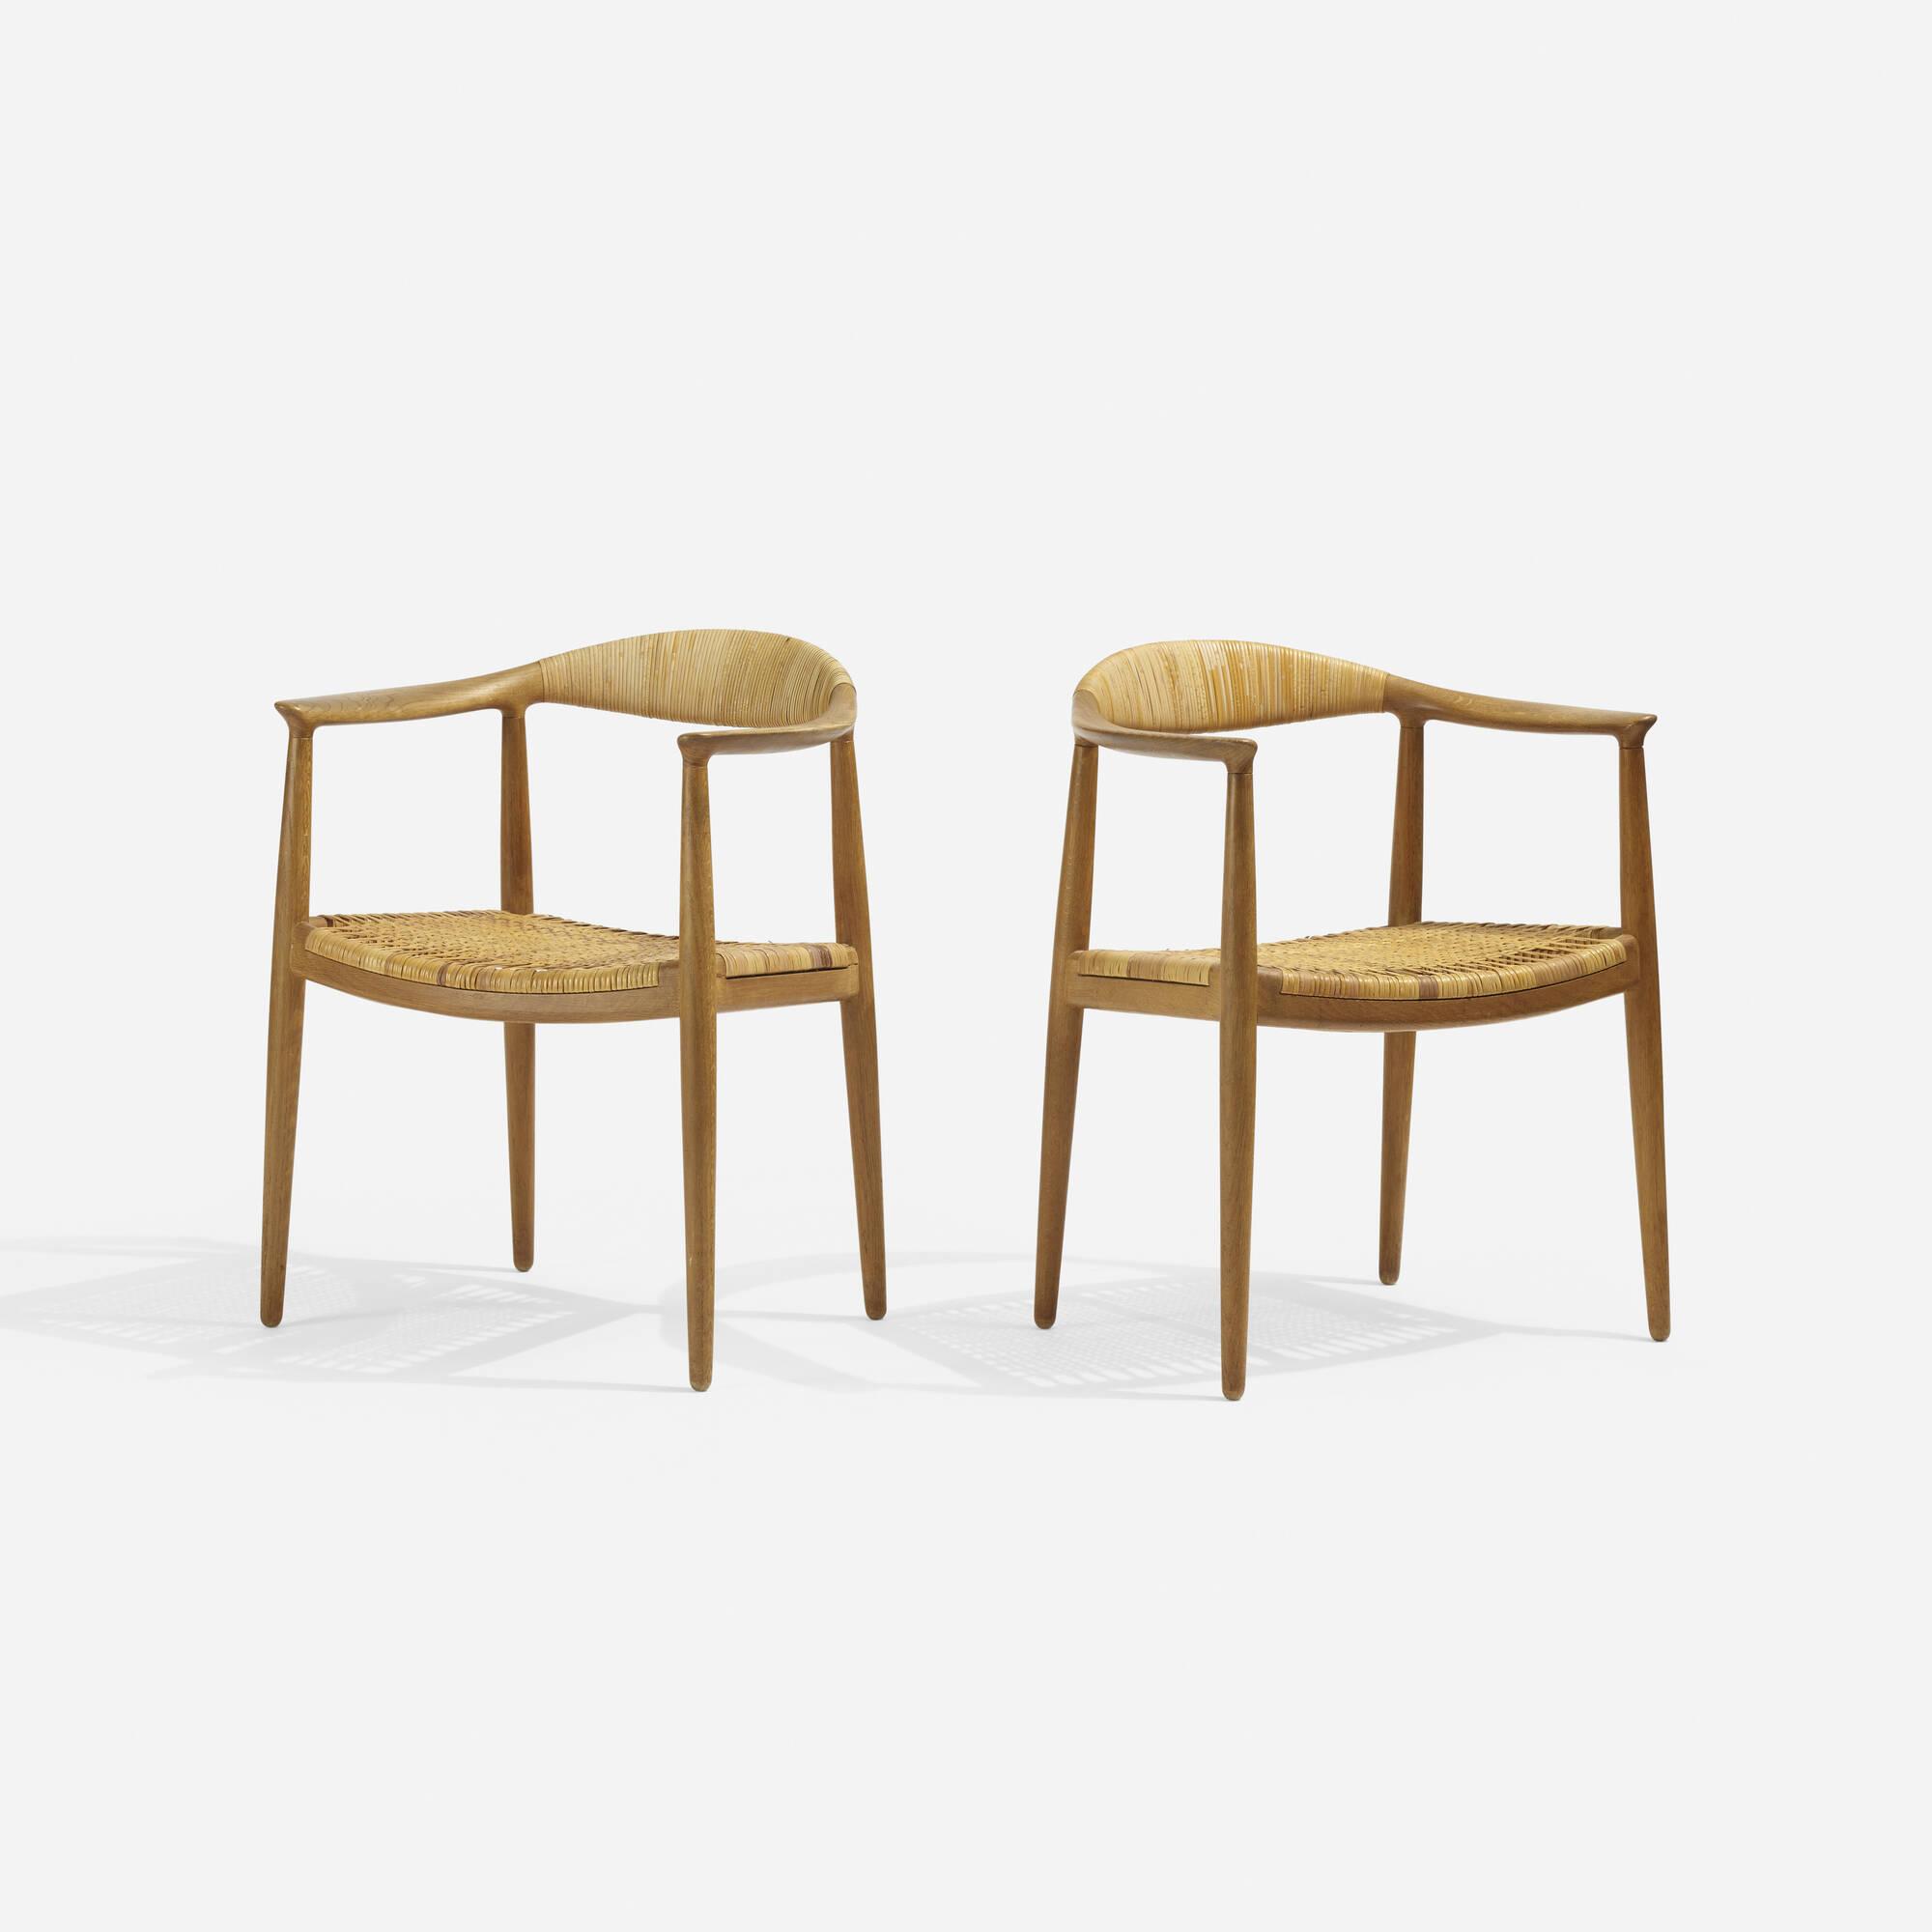 316: Hans J. Wegner / The Chairs, pair (1 of 3)